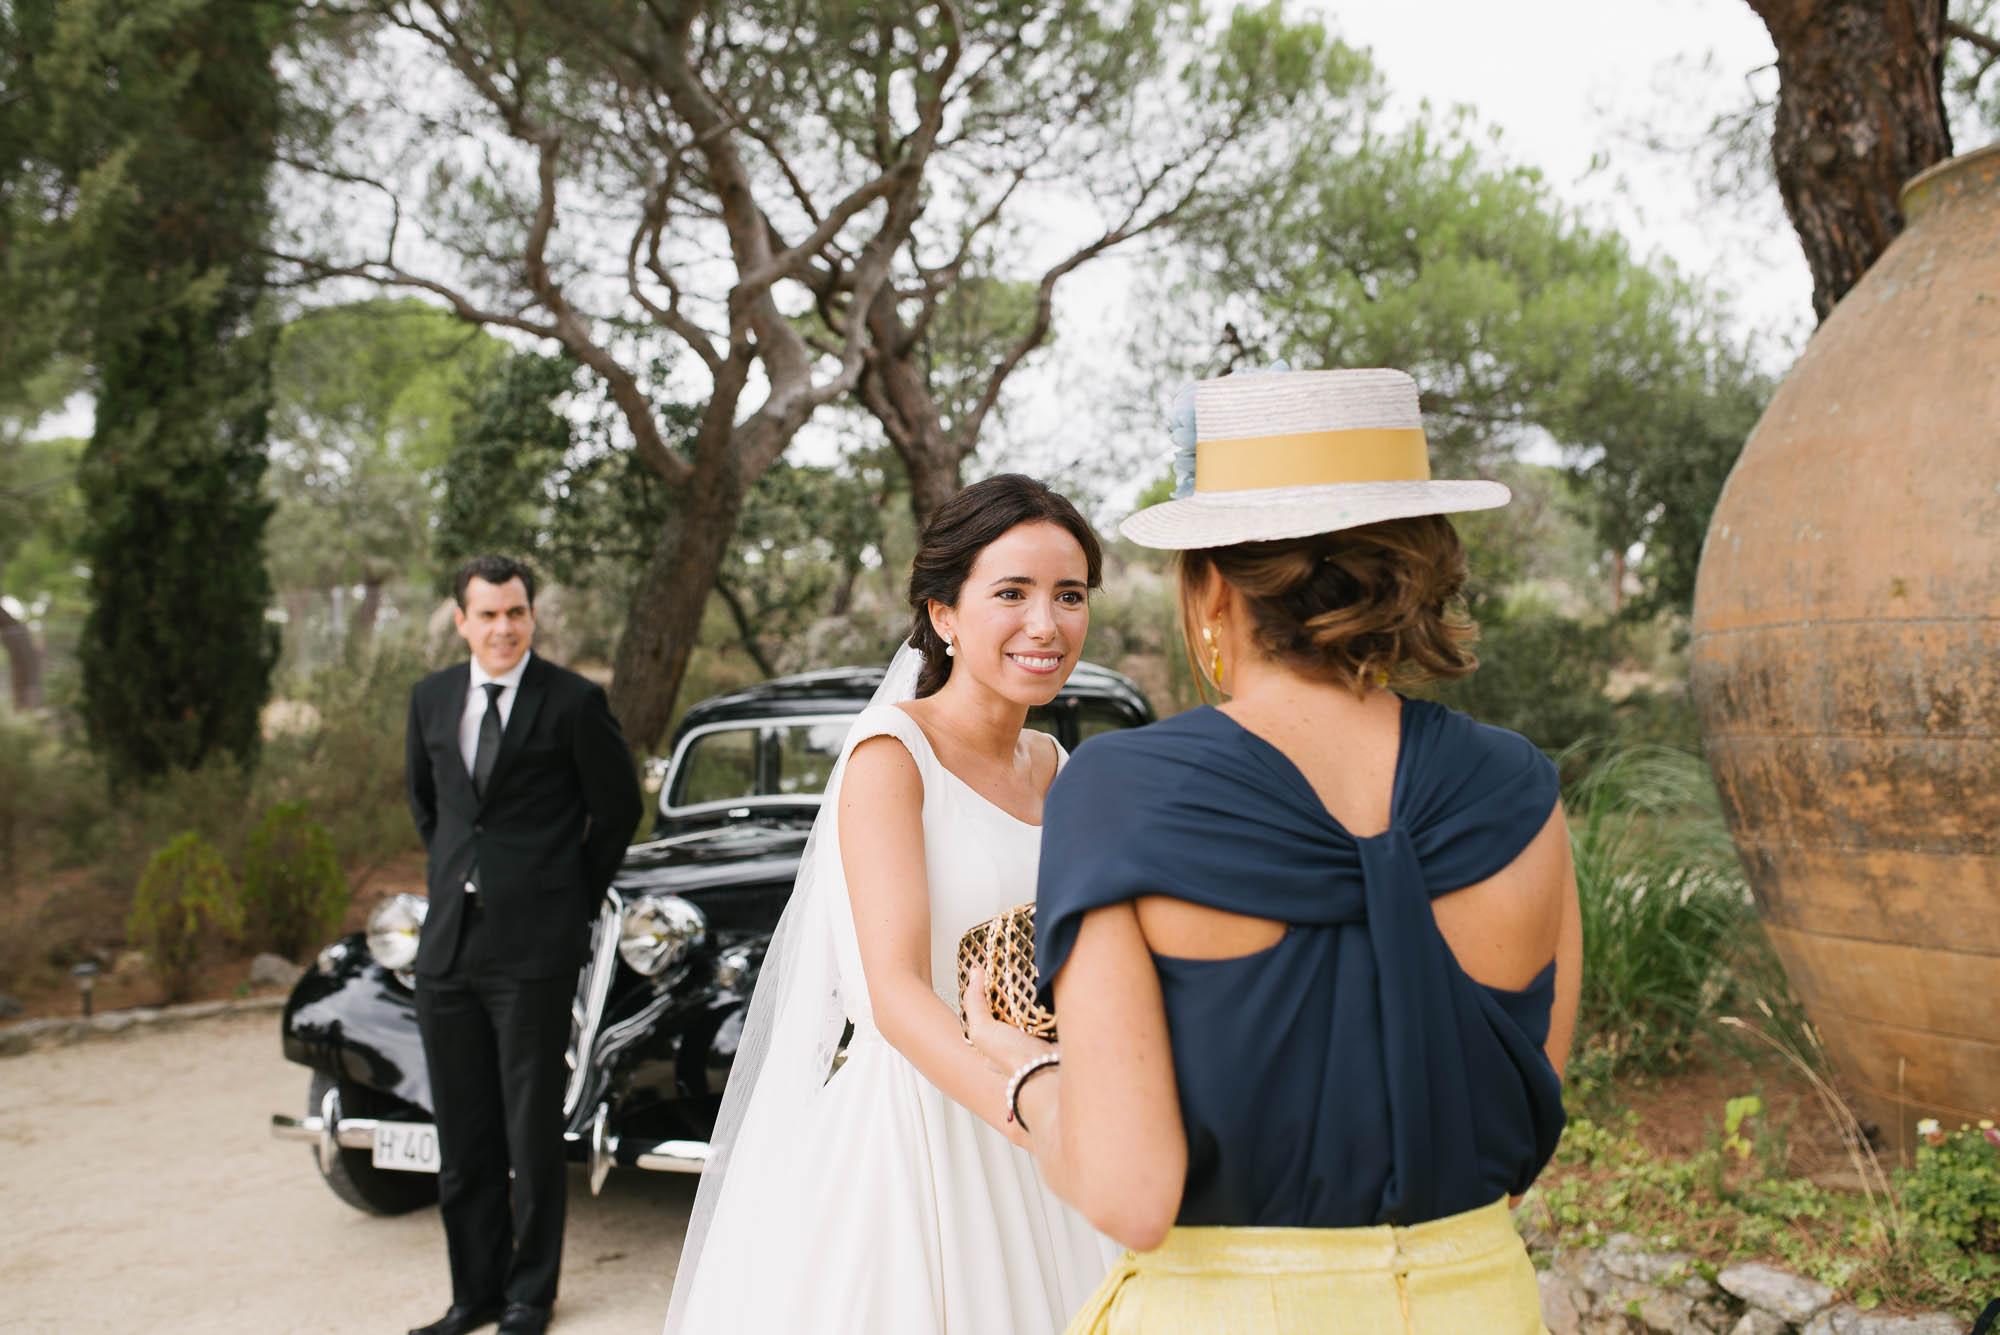 La novia saluda a la invitada